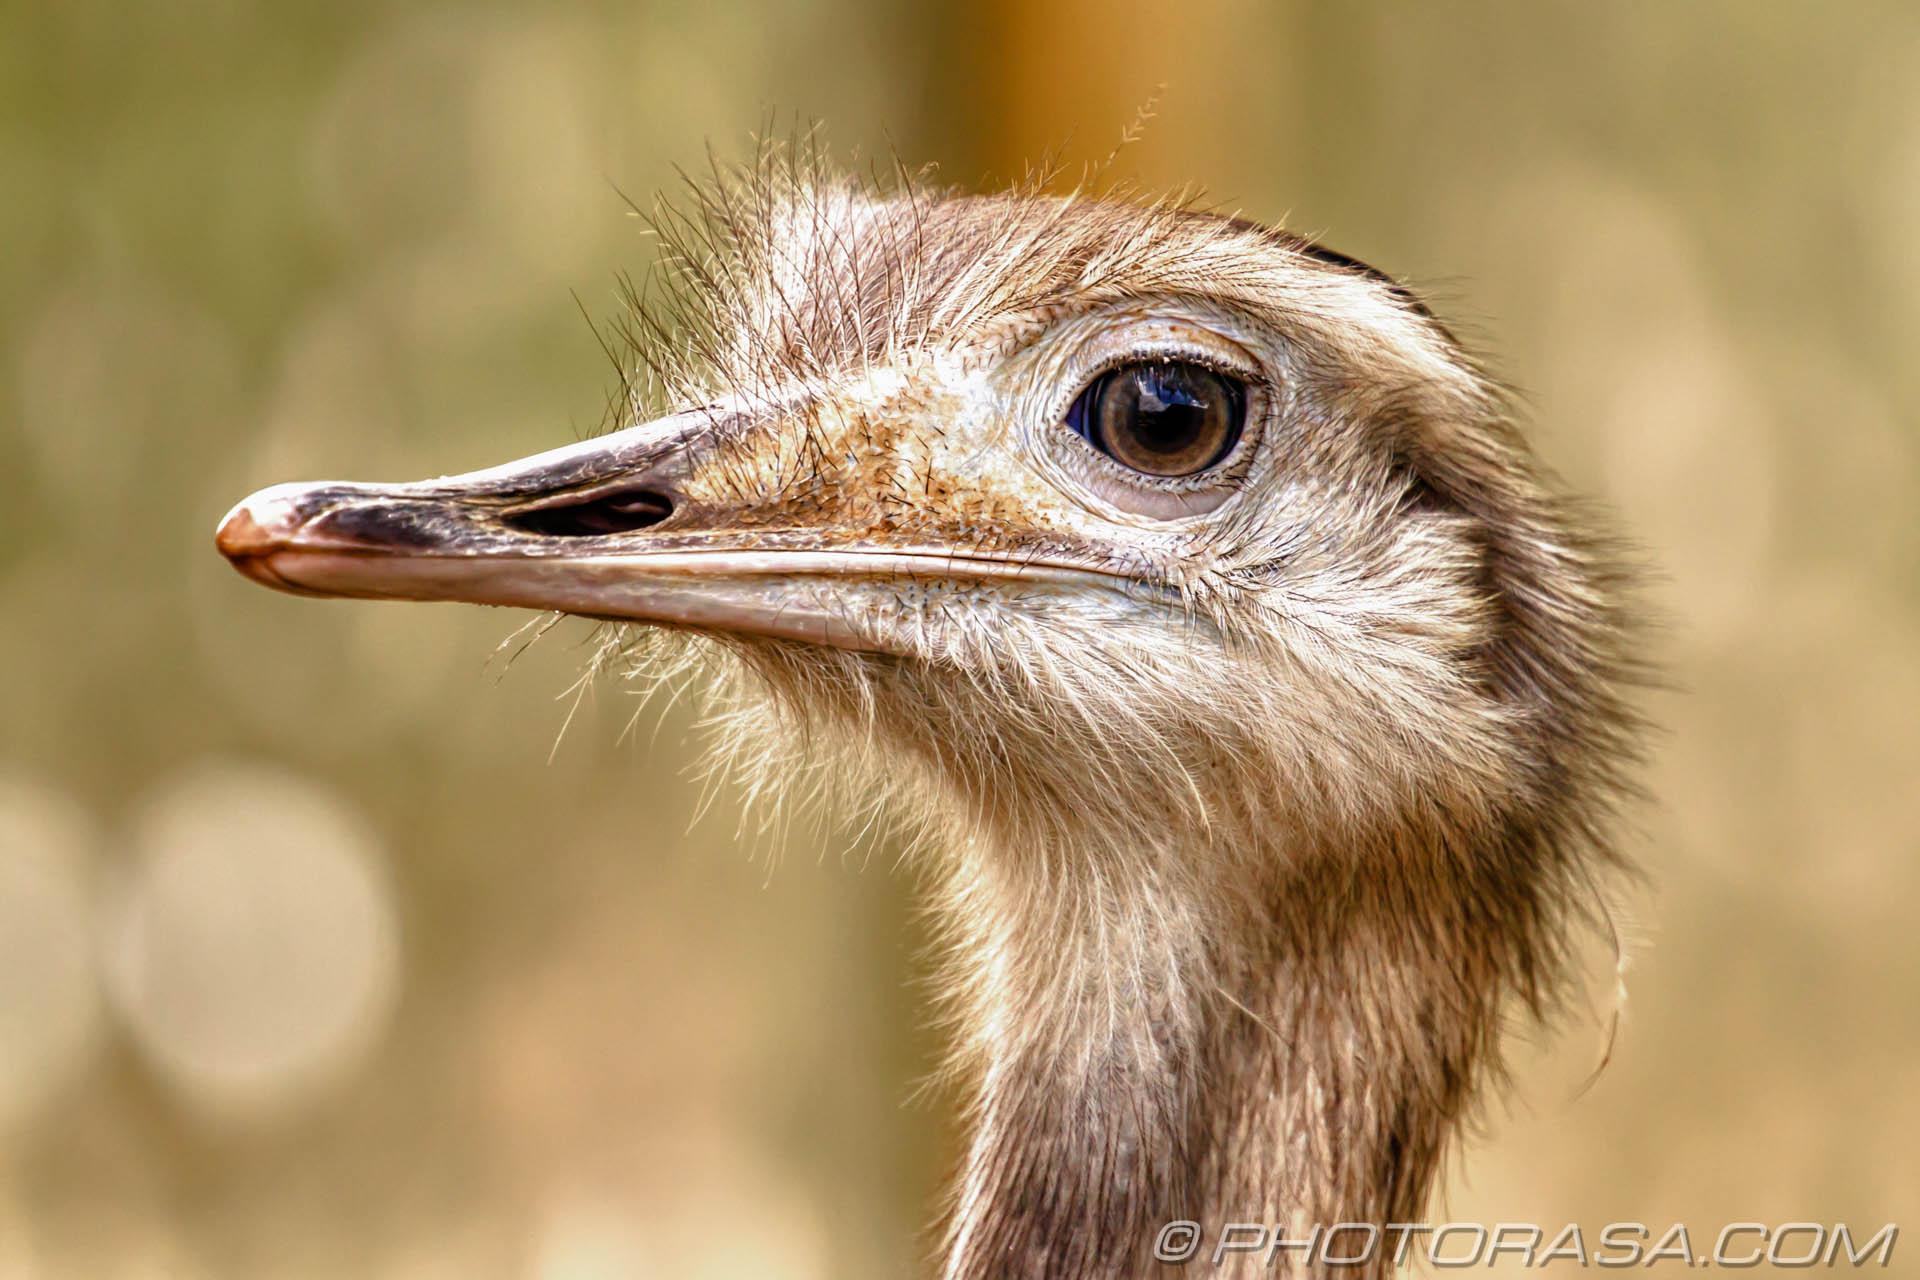 http://photorasa.com/birds-greenworld/greater-rhea-close-up/